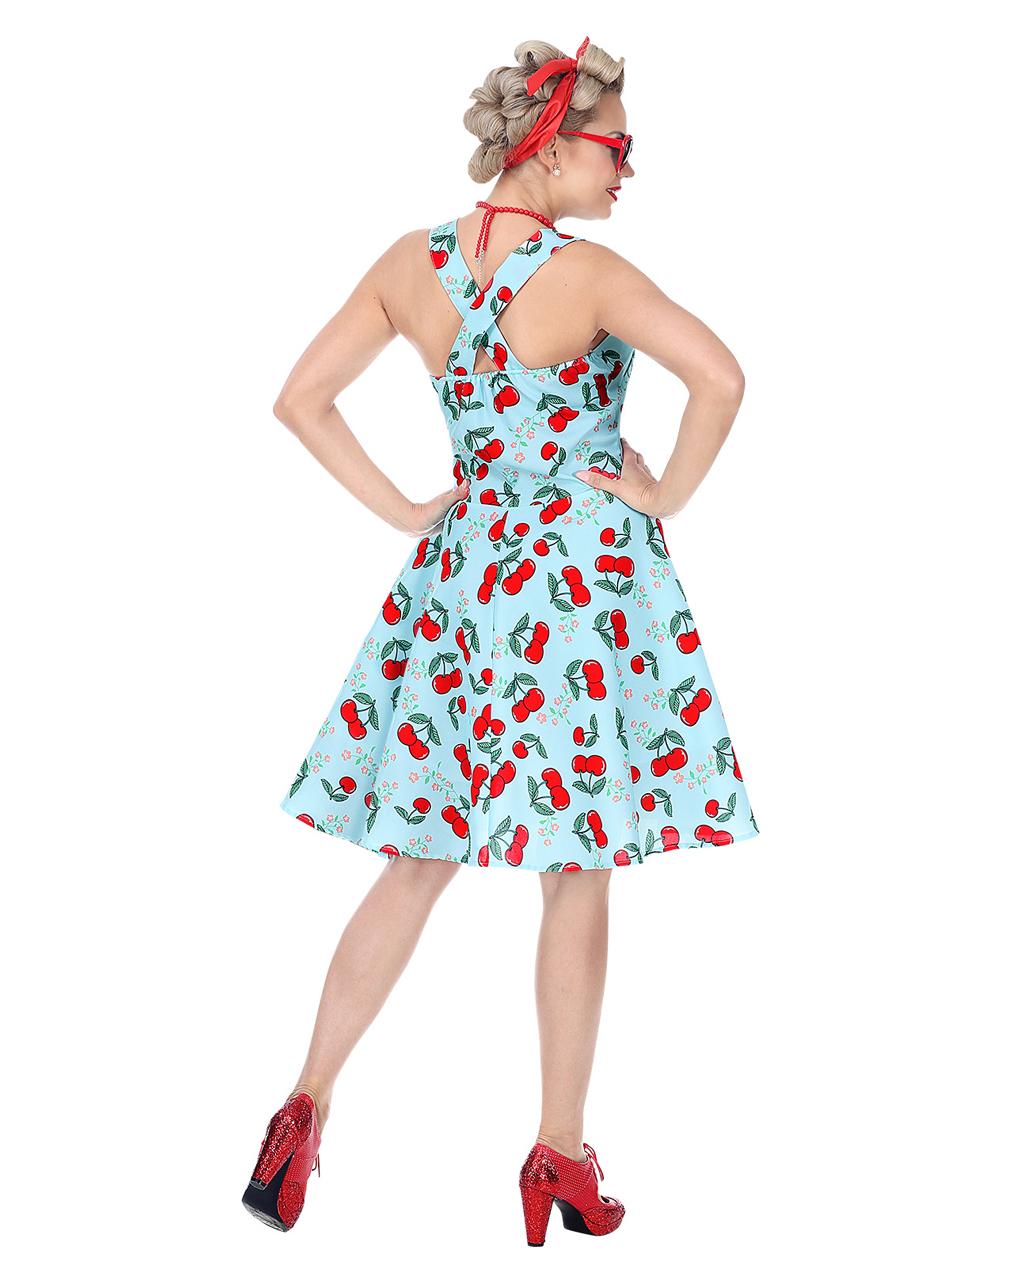 daeea0de87c98 50's Rock'n Roll Dress With Petticoat buy | - Karneval Universe